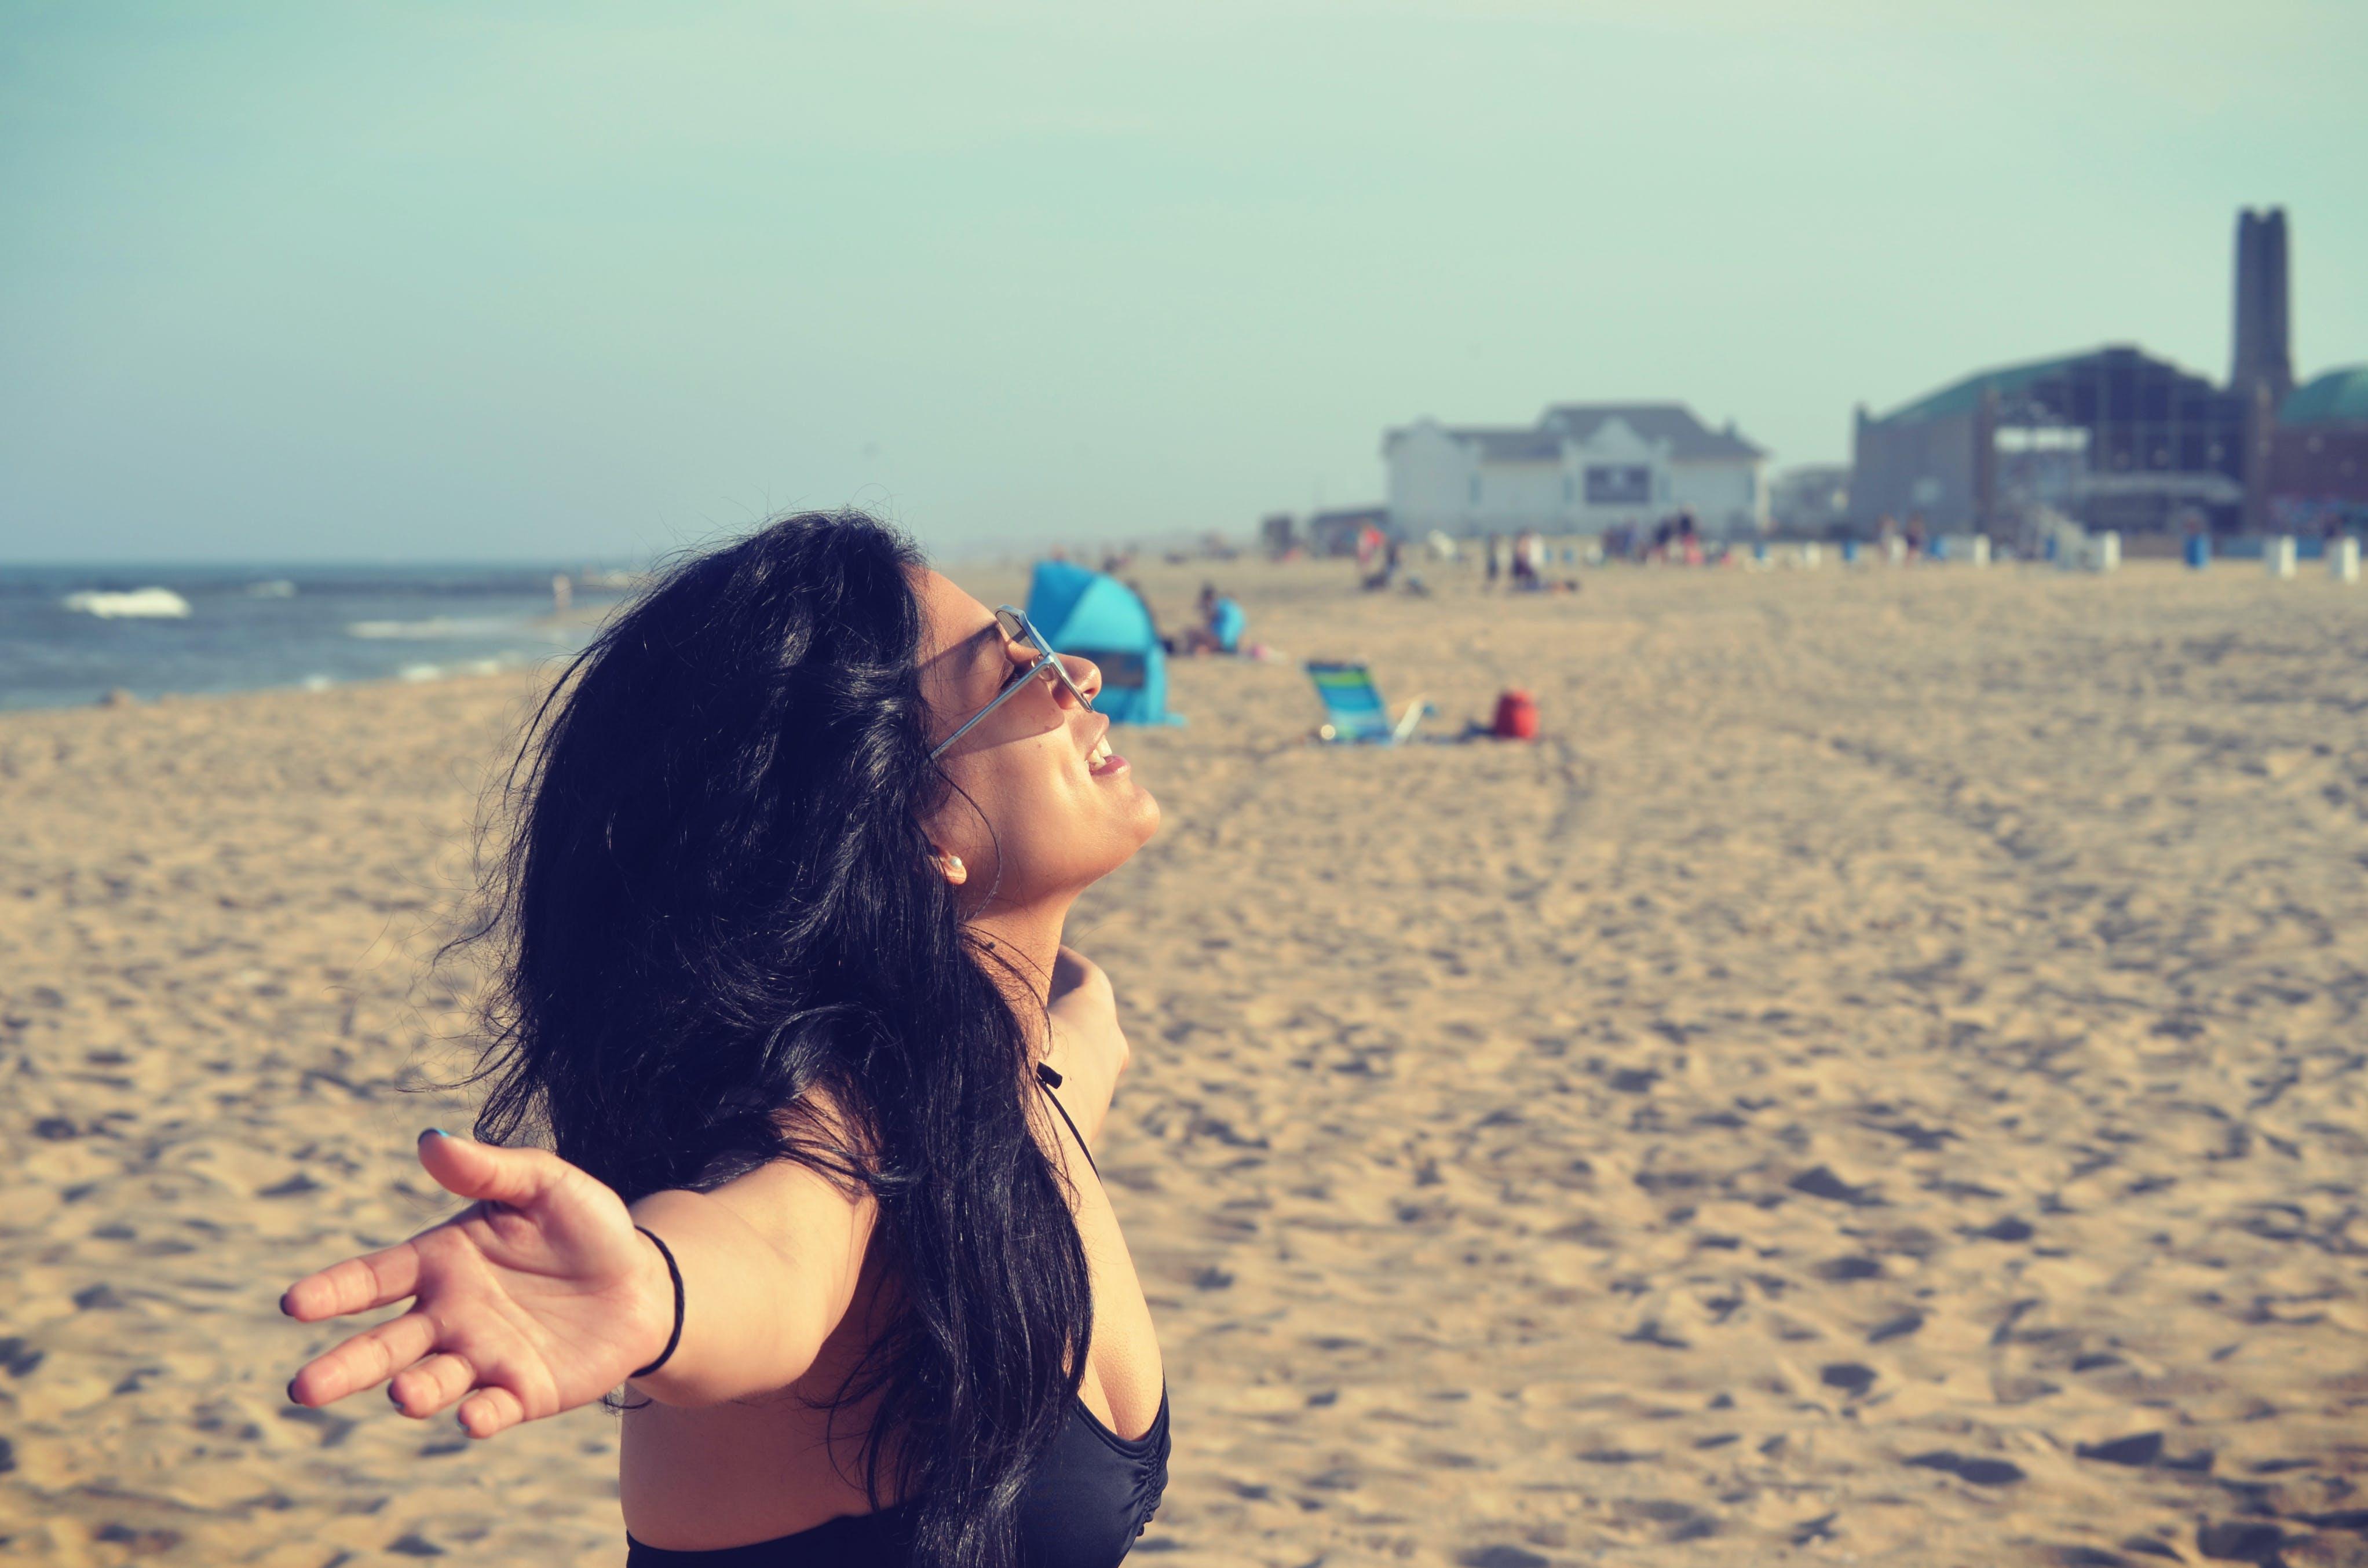 Woman in Black Bra at Beach